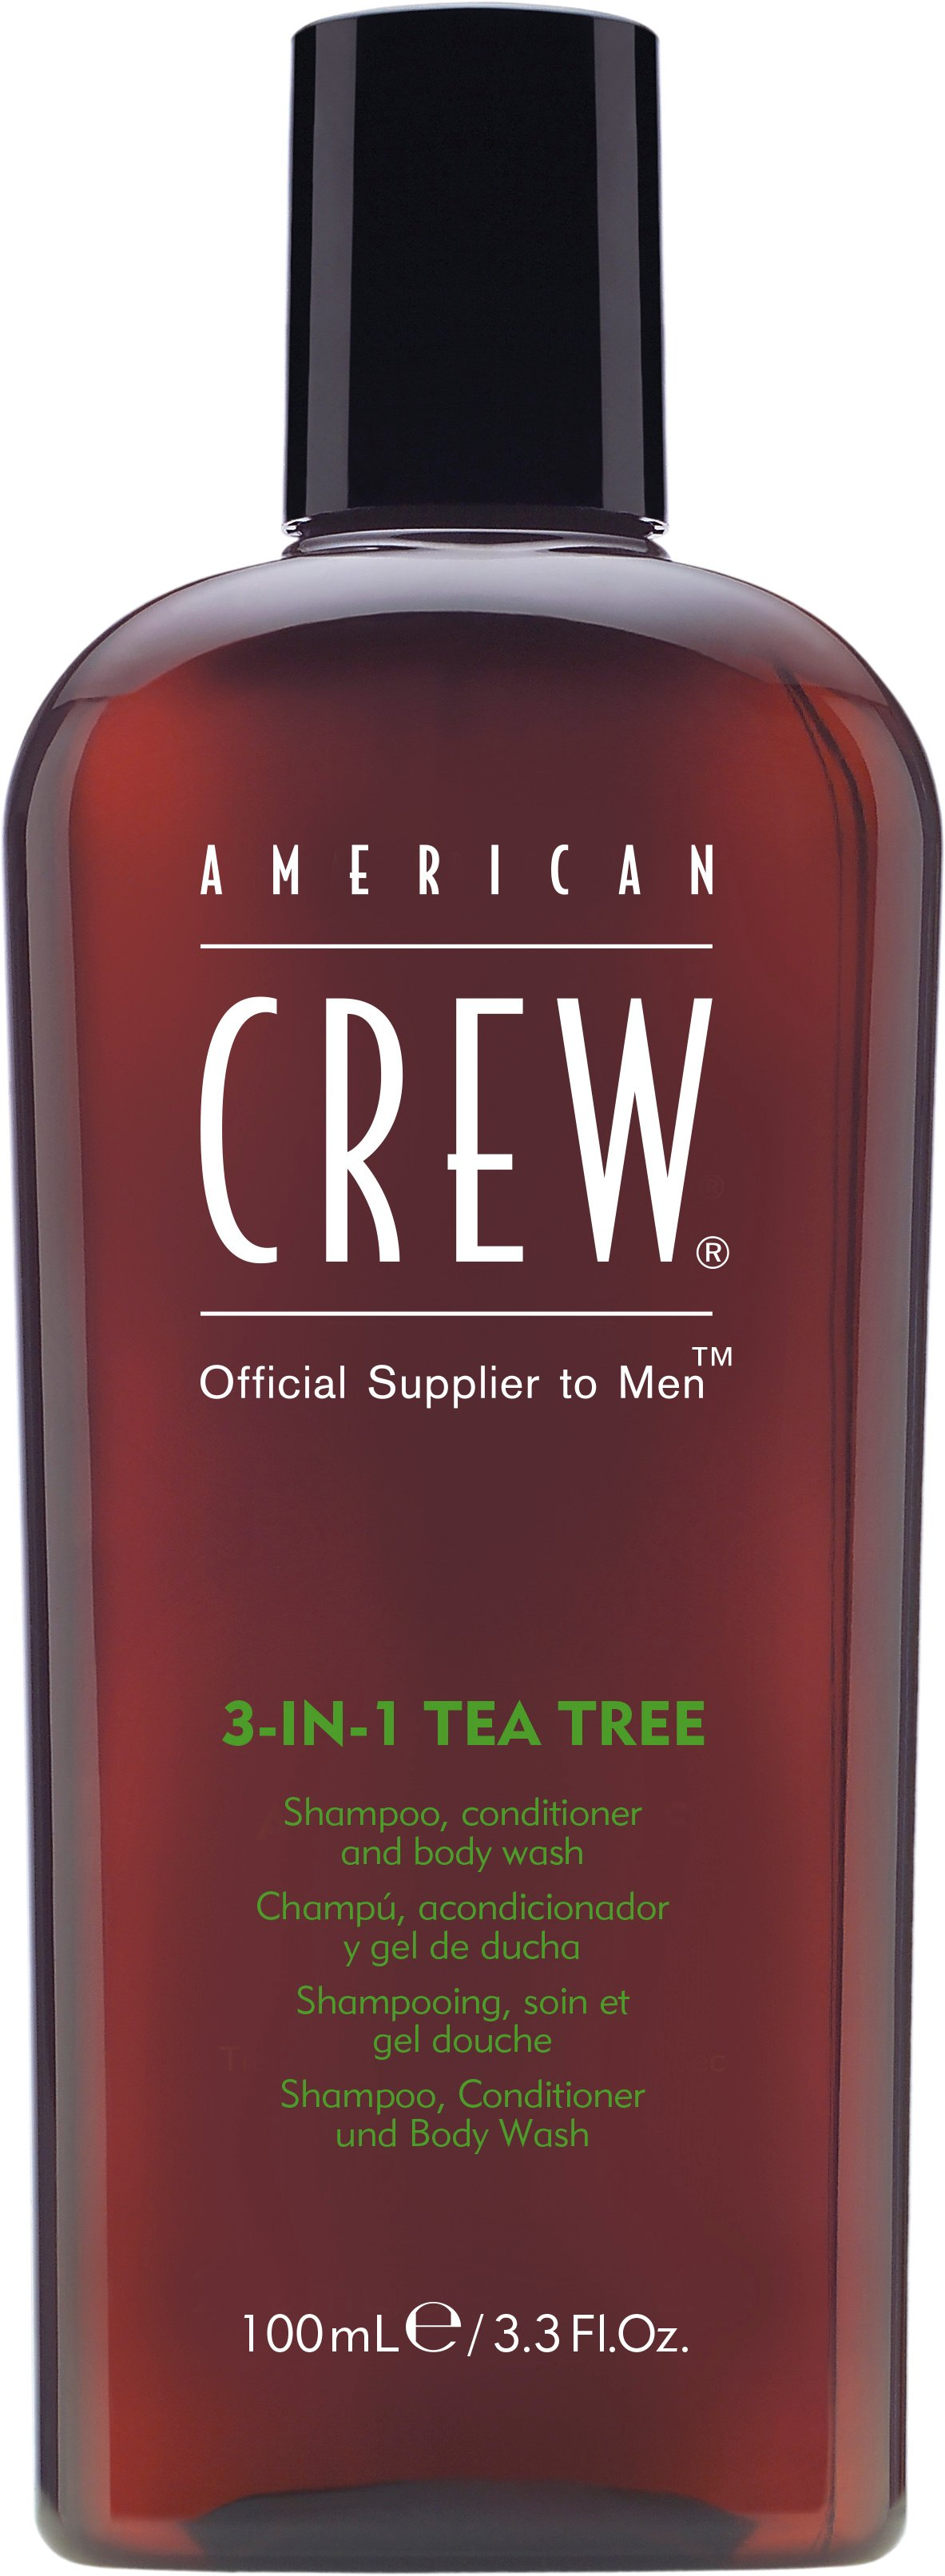 American Crew - Hair&Body 3-in-1 Tea Tree Shampoo 450 ml